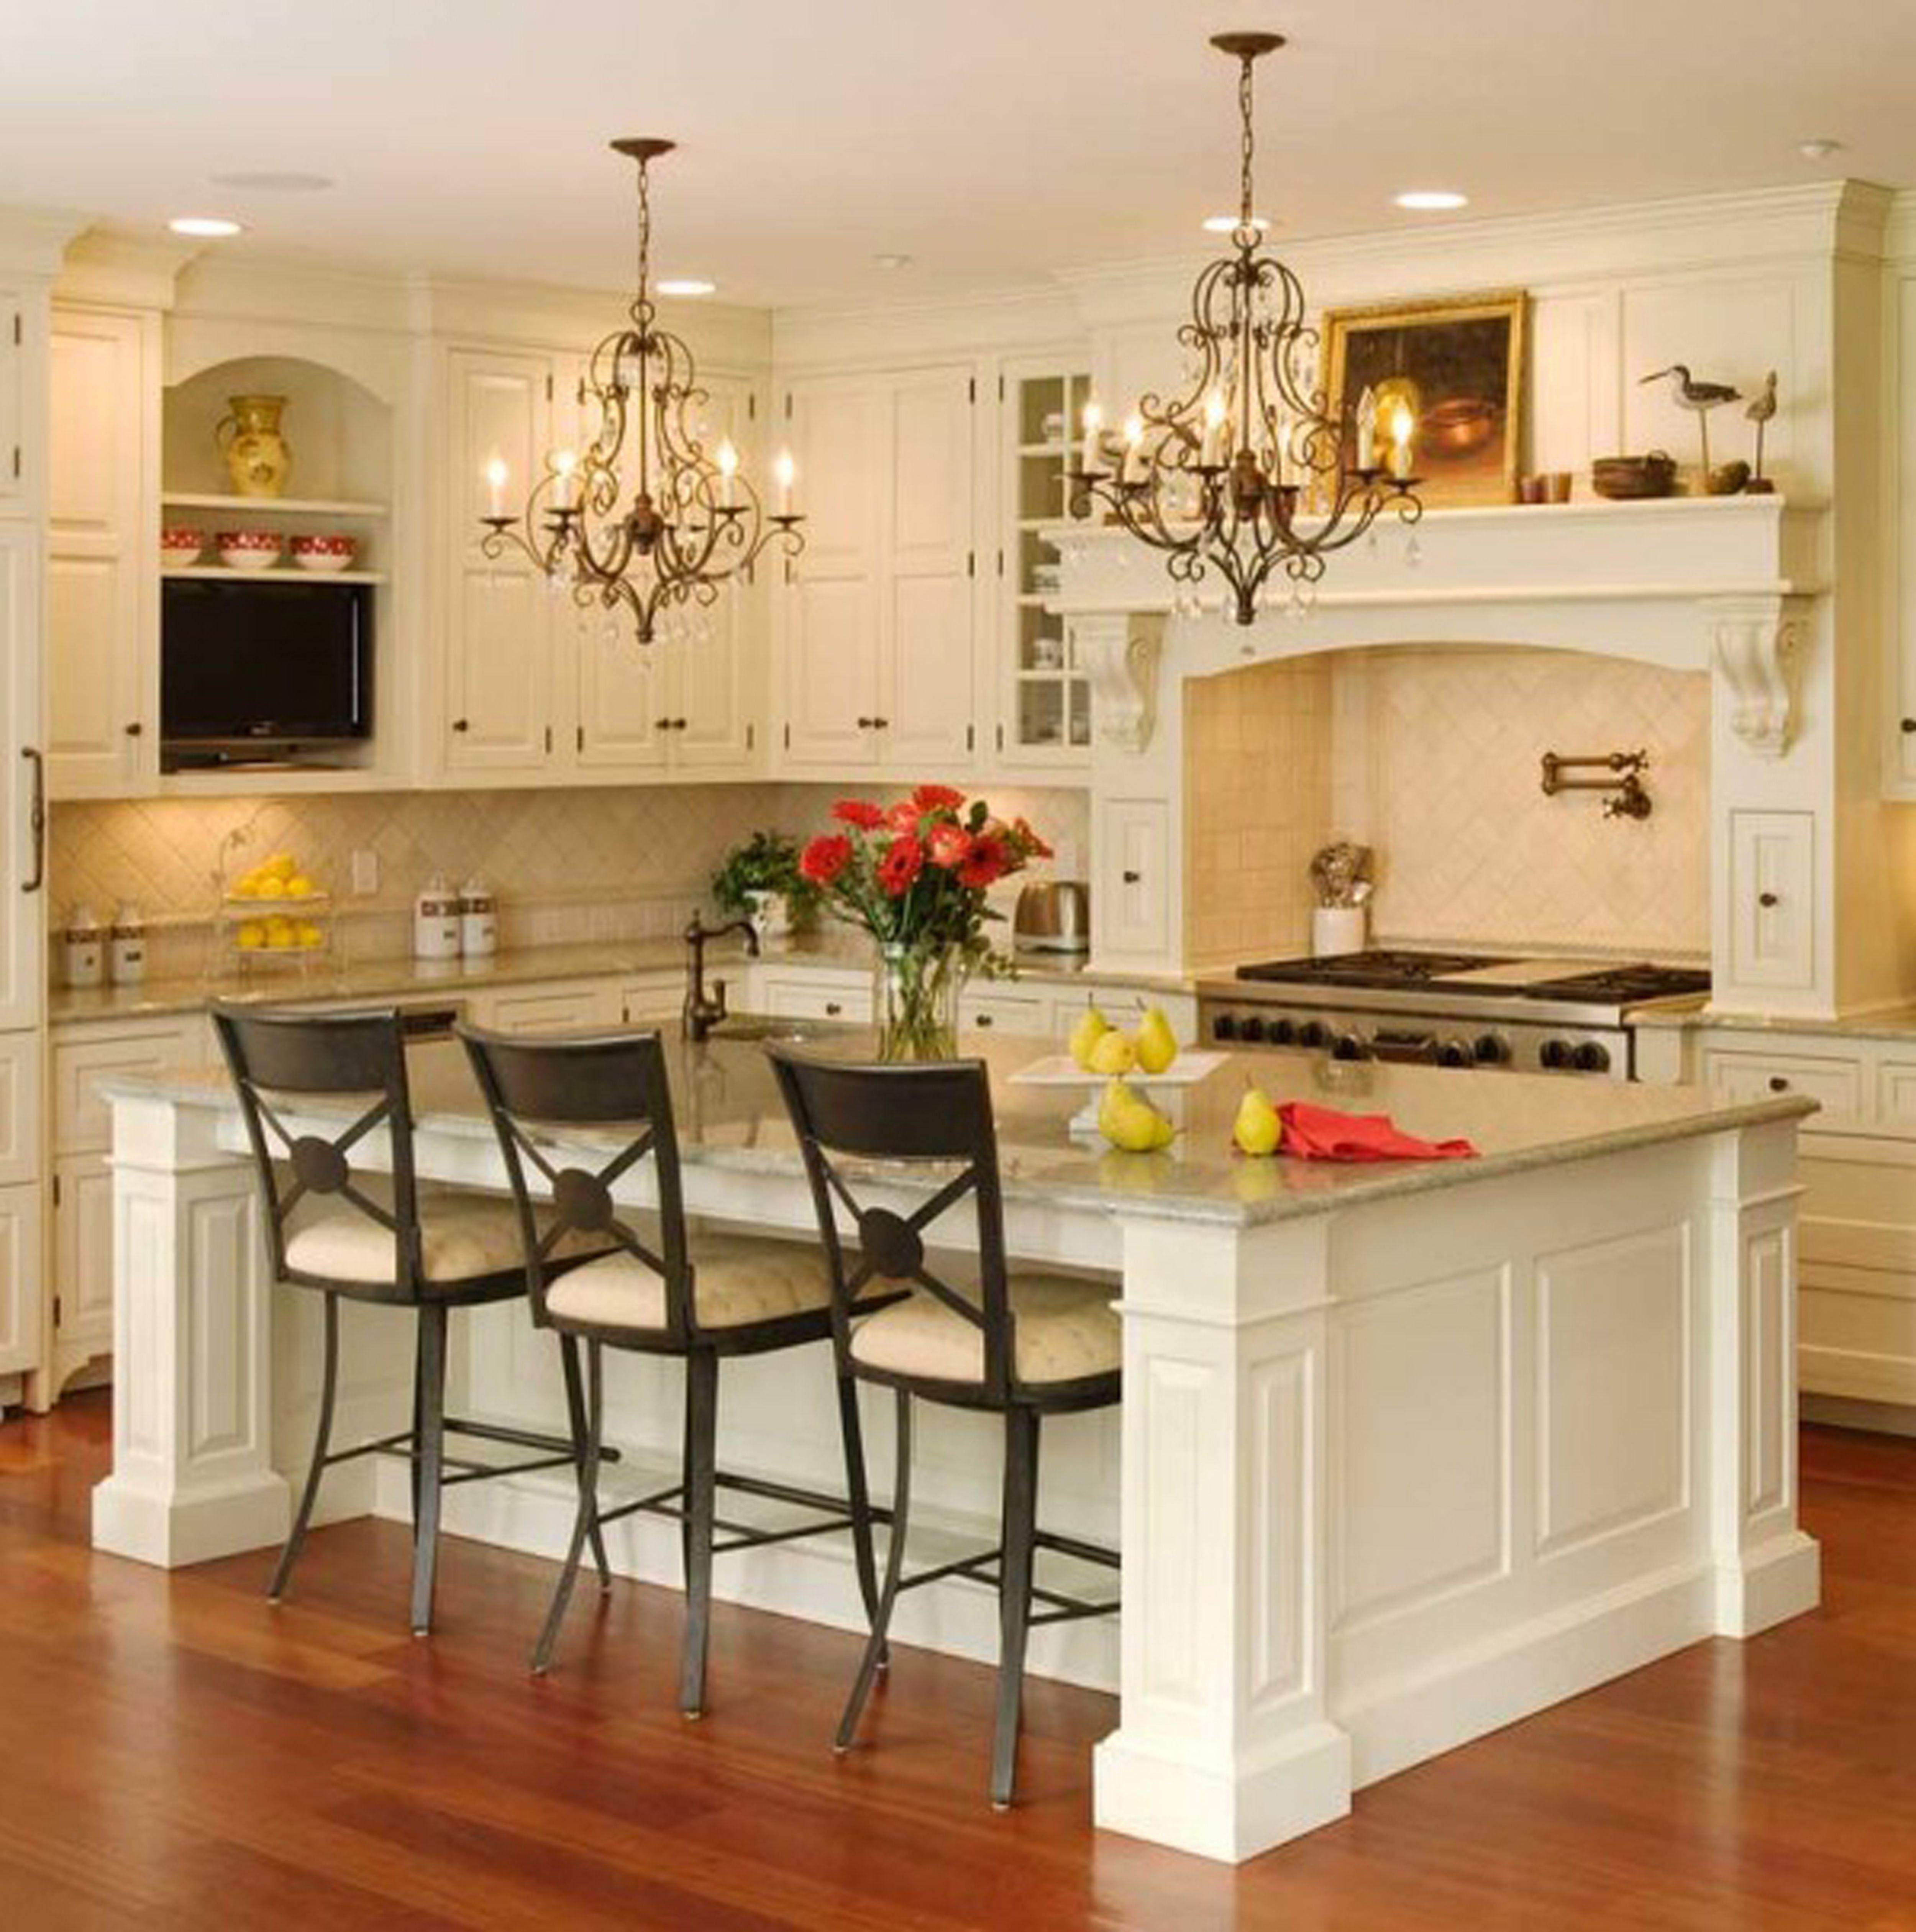 Best ideas about Kitchen Decoration Ideas . Save or Pin Kitchen Decorating Ideas s Now.